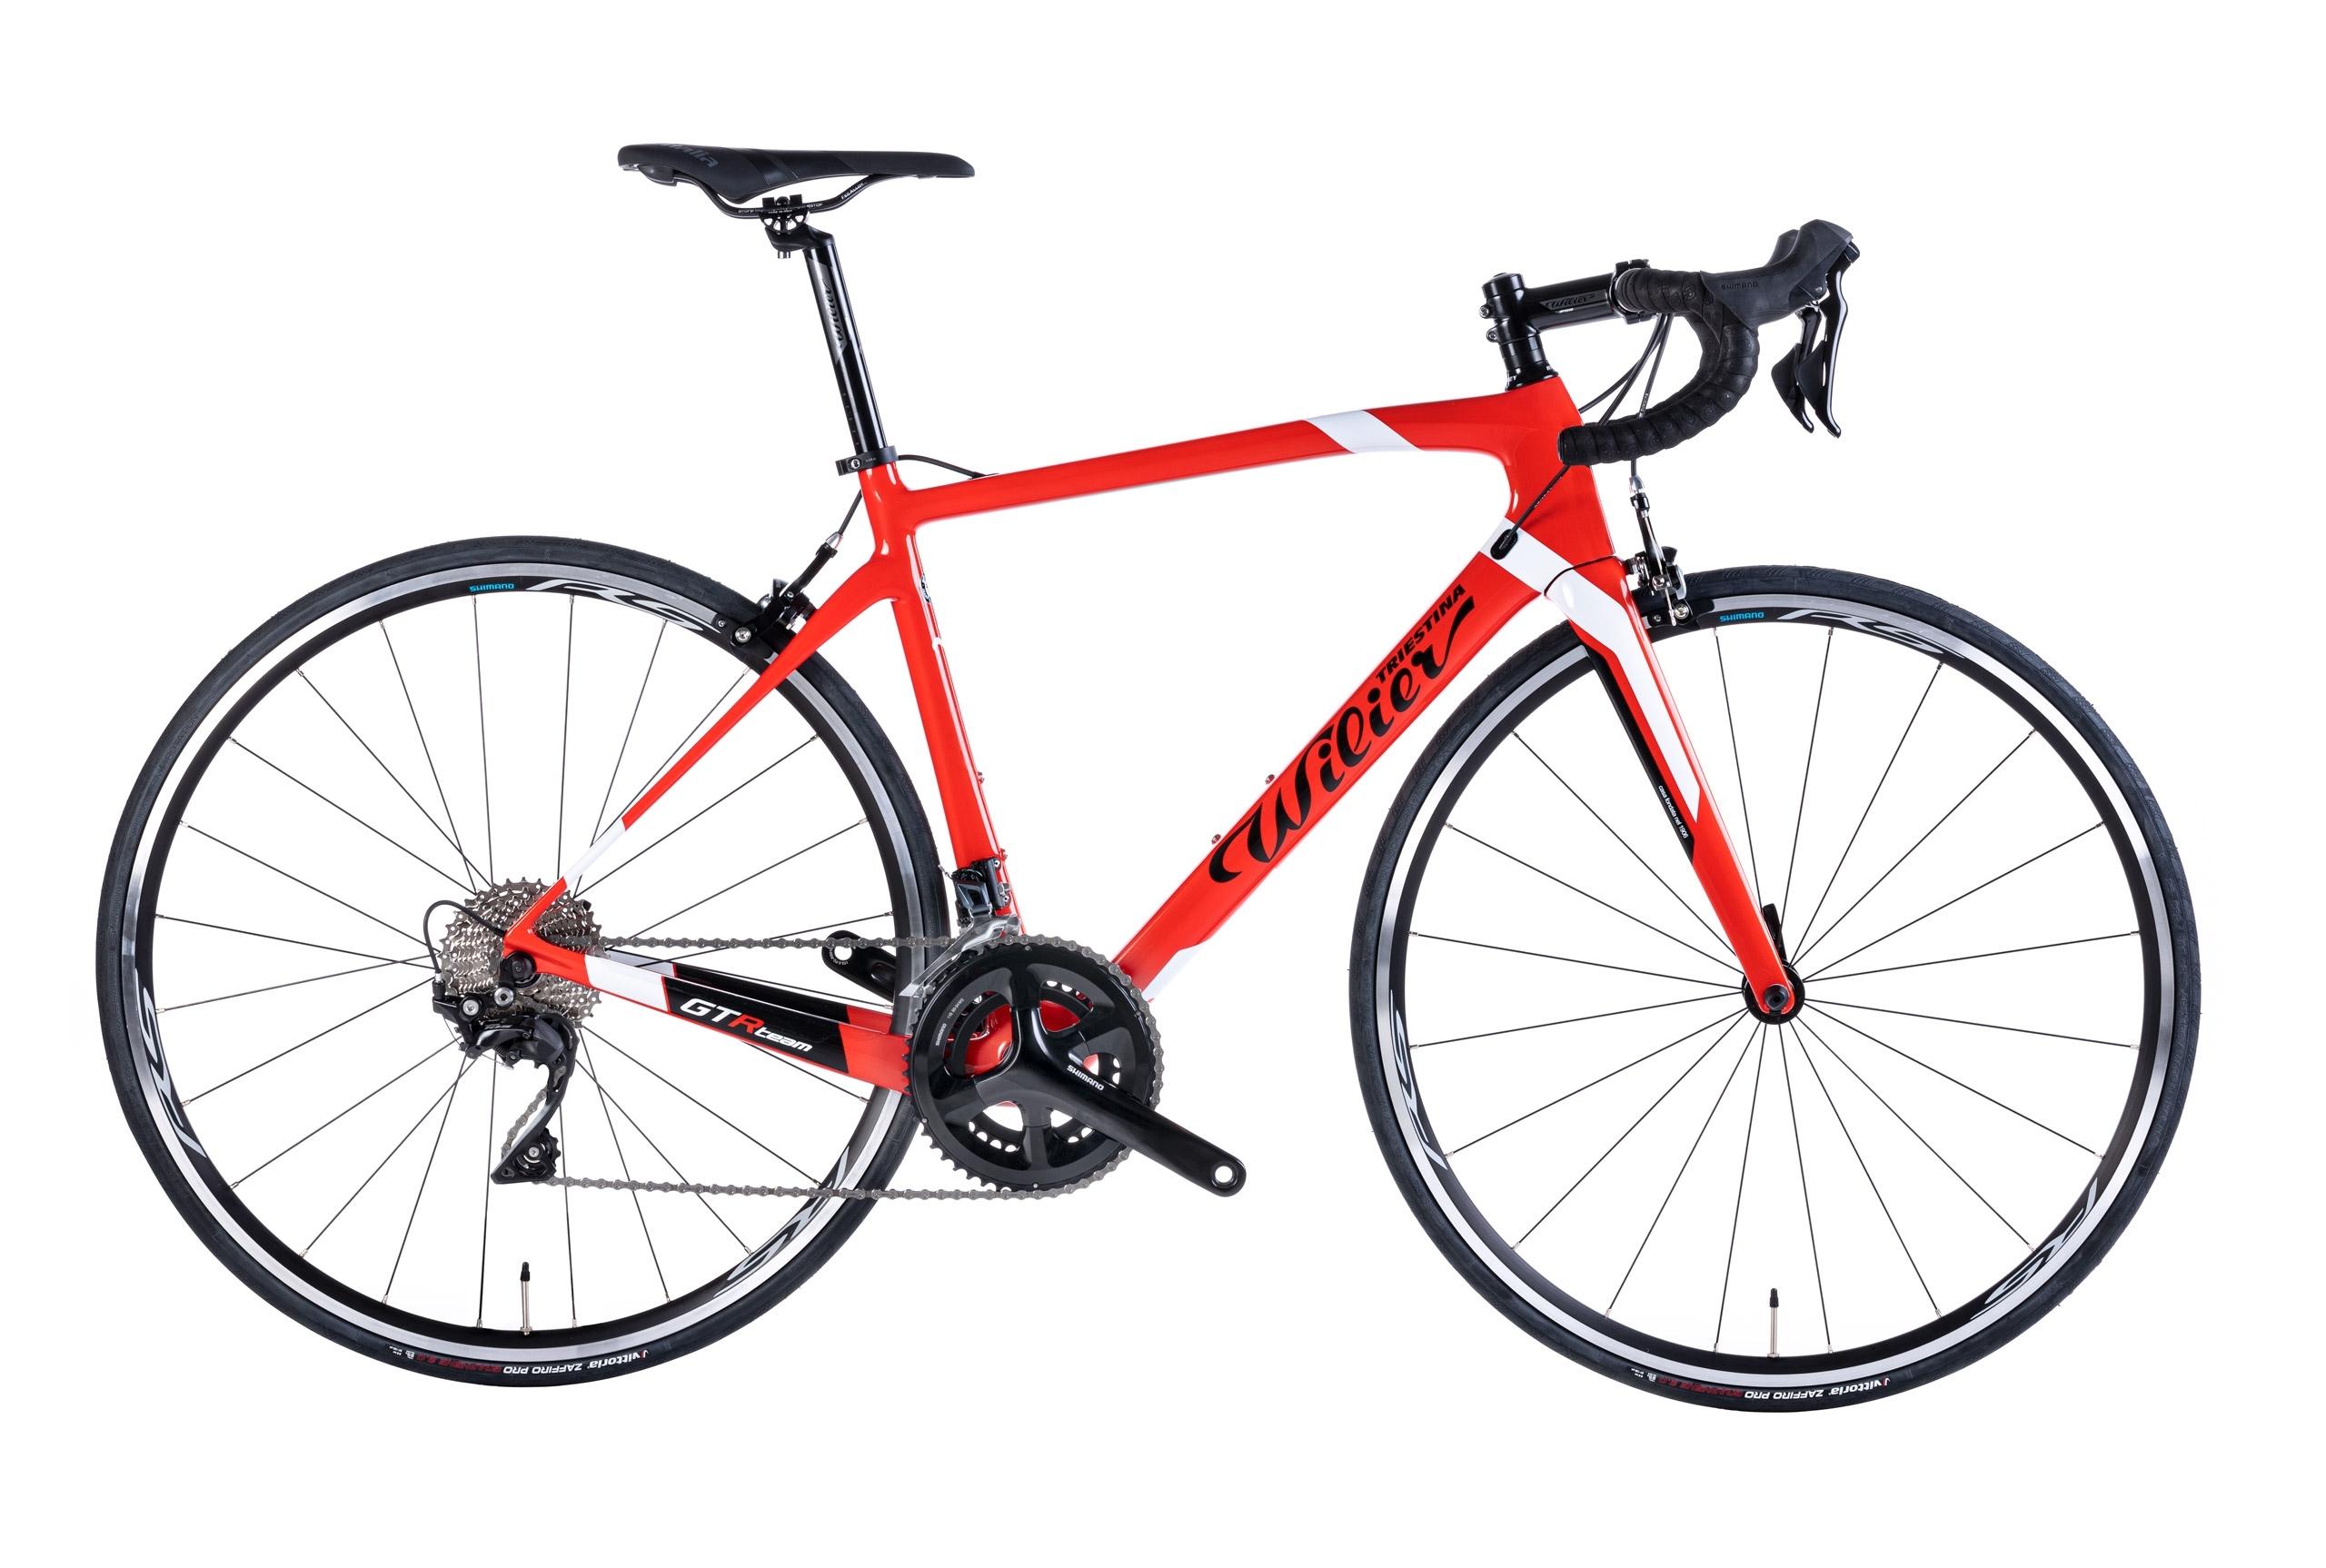 kolo GTR TEAM 2021 Rim+SH105 2.0+RS100 red white M